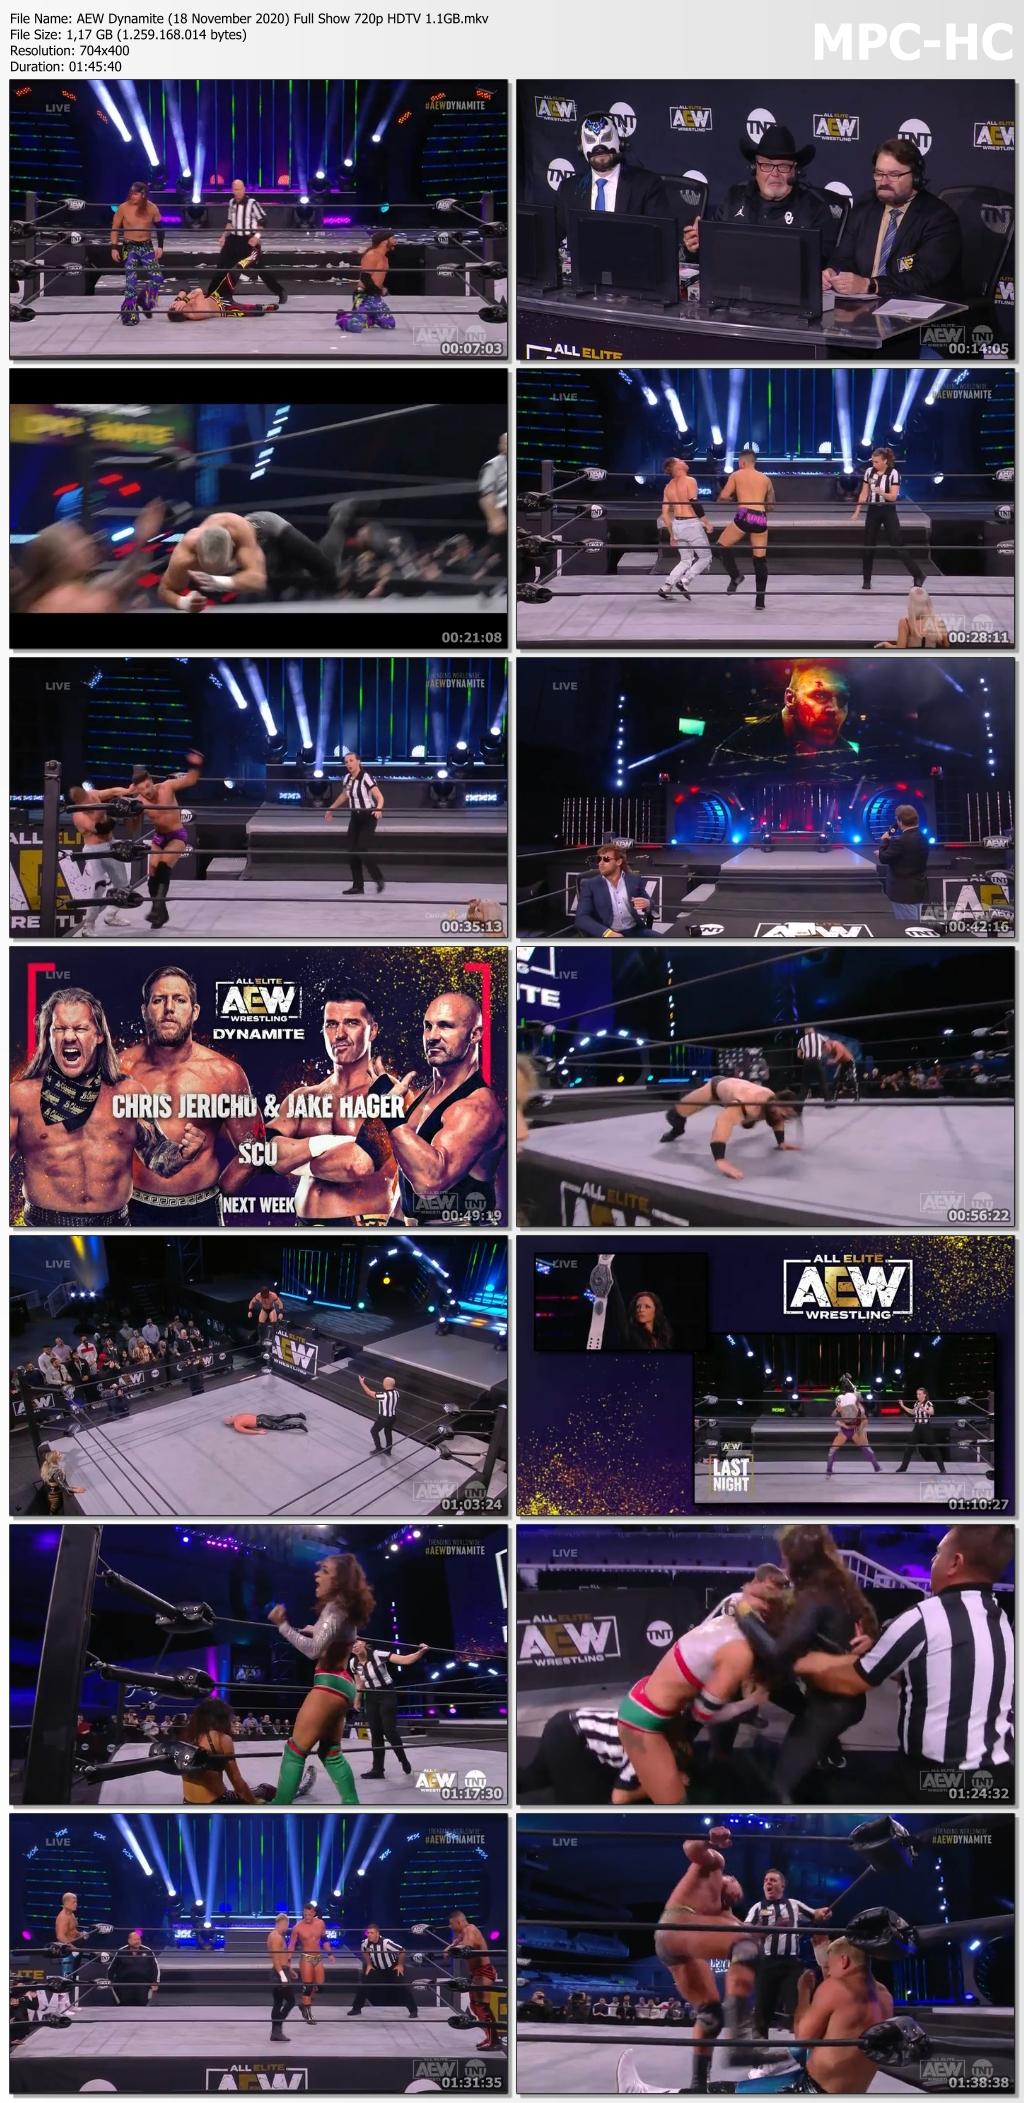 AEW-Dynamite-18-November-2020-Full-Show-720p-HDTV-1-1-GB-mkv-thumbs